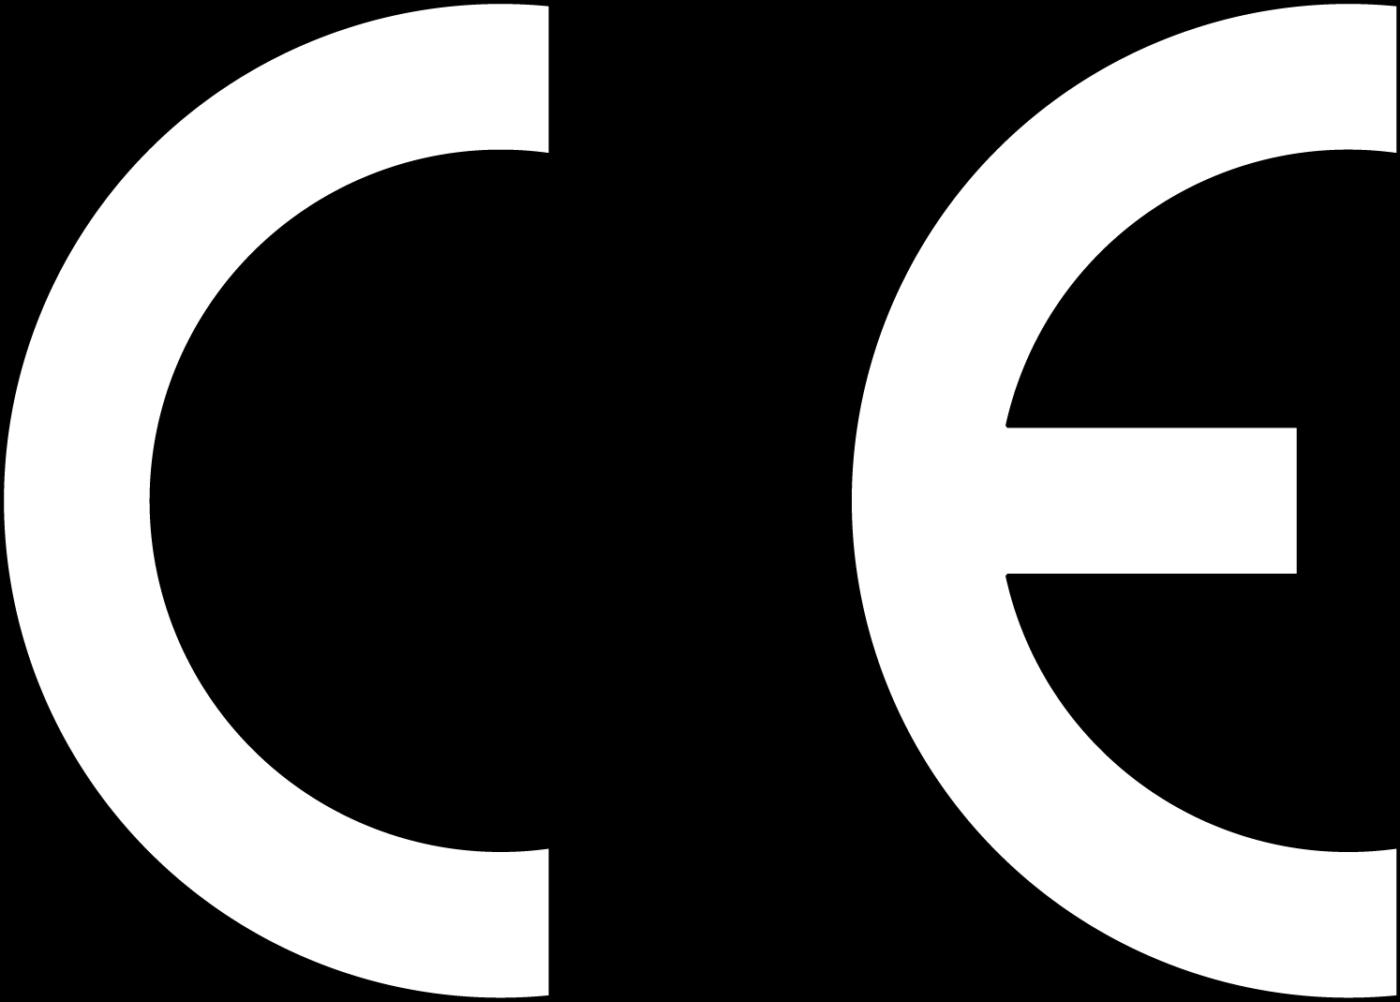 CE Siegel